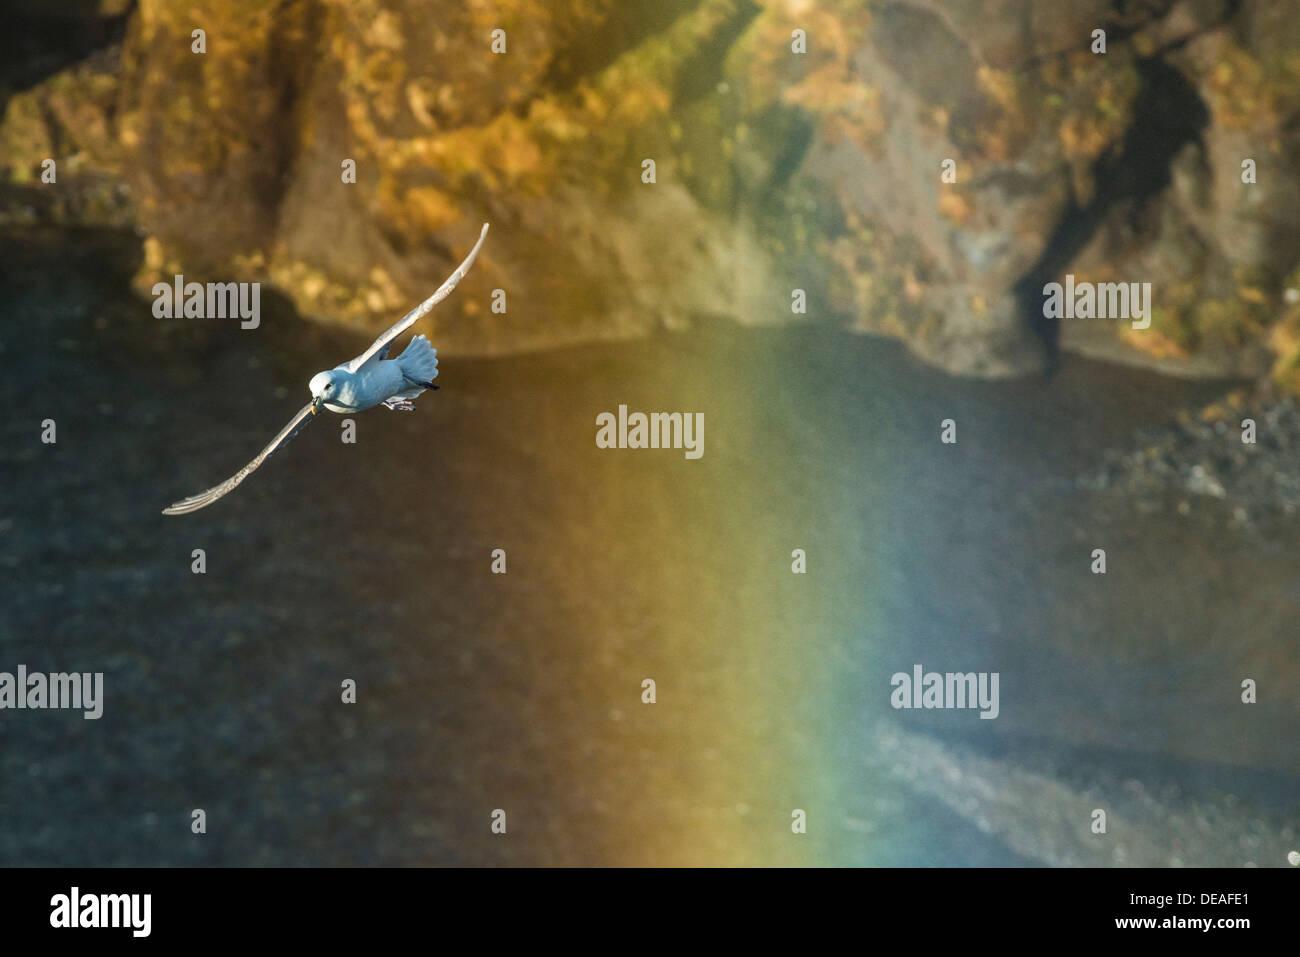 Fulmar, Northern Fulmar or Arctic Fulmar (Fulmarus glacialis) in flight, in the rainbow of a waterfall, Skogafoss, Skógar - Stock Image